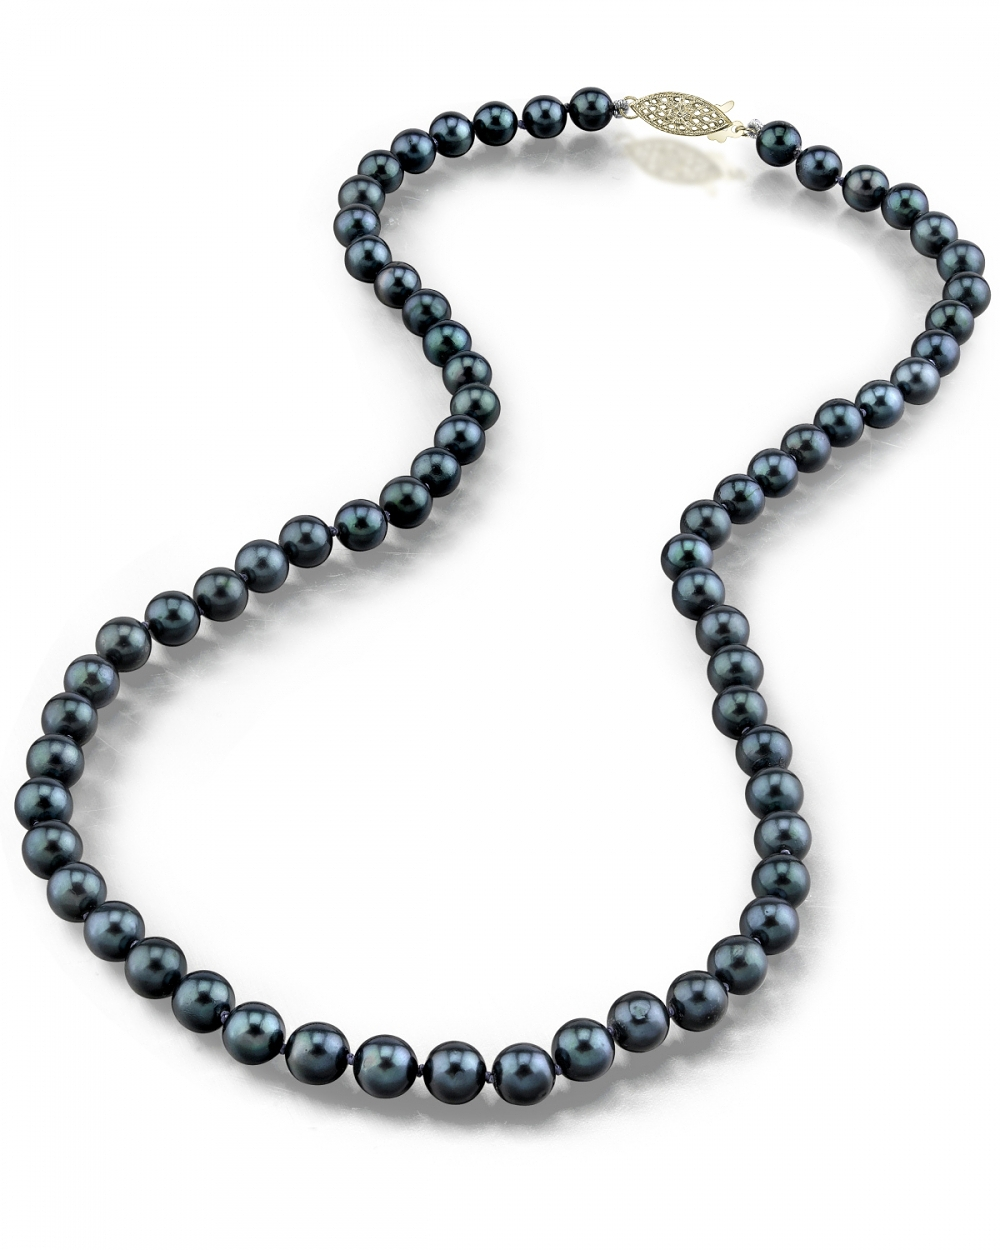 Pearl Necklace Akoya: 14K Gold 5.5-6.0mm Japanese Akoya Black Cultured Pearl